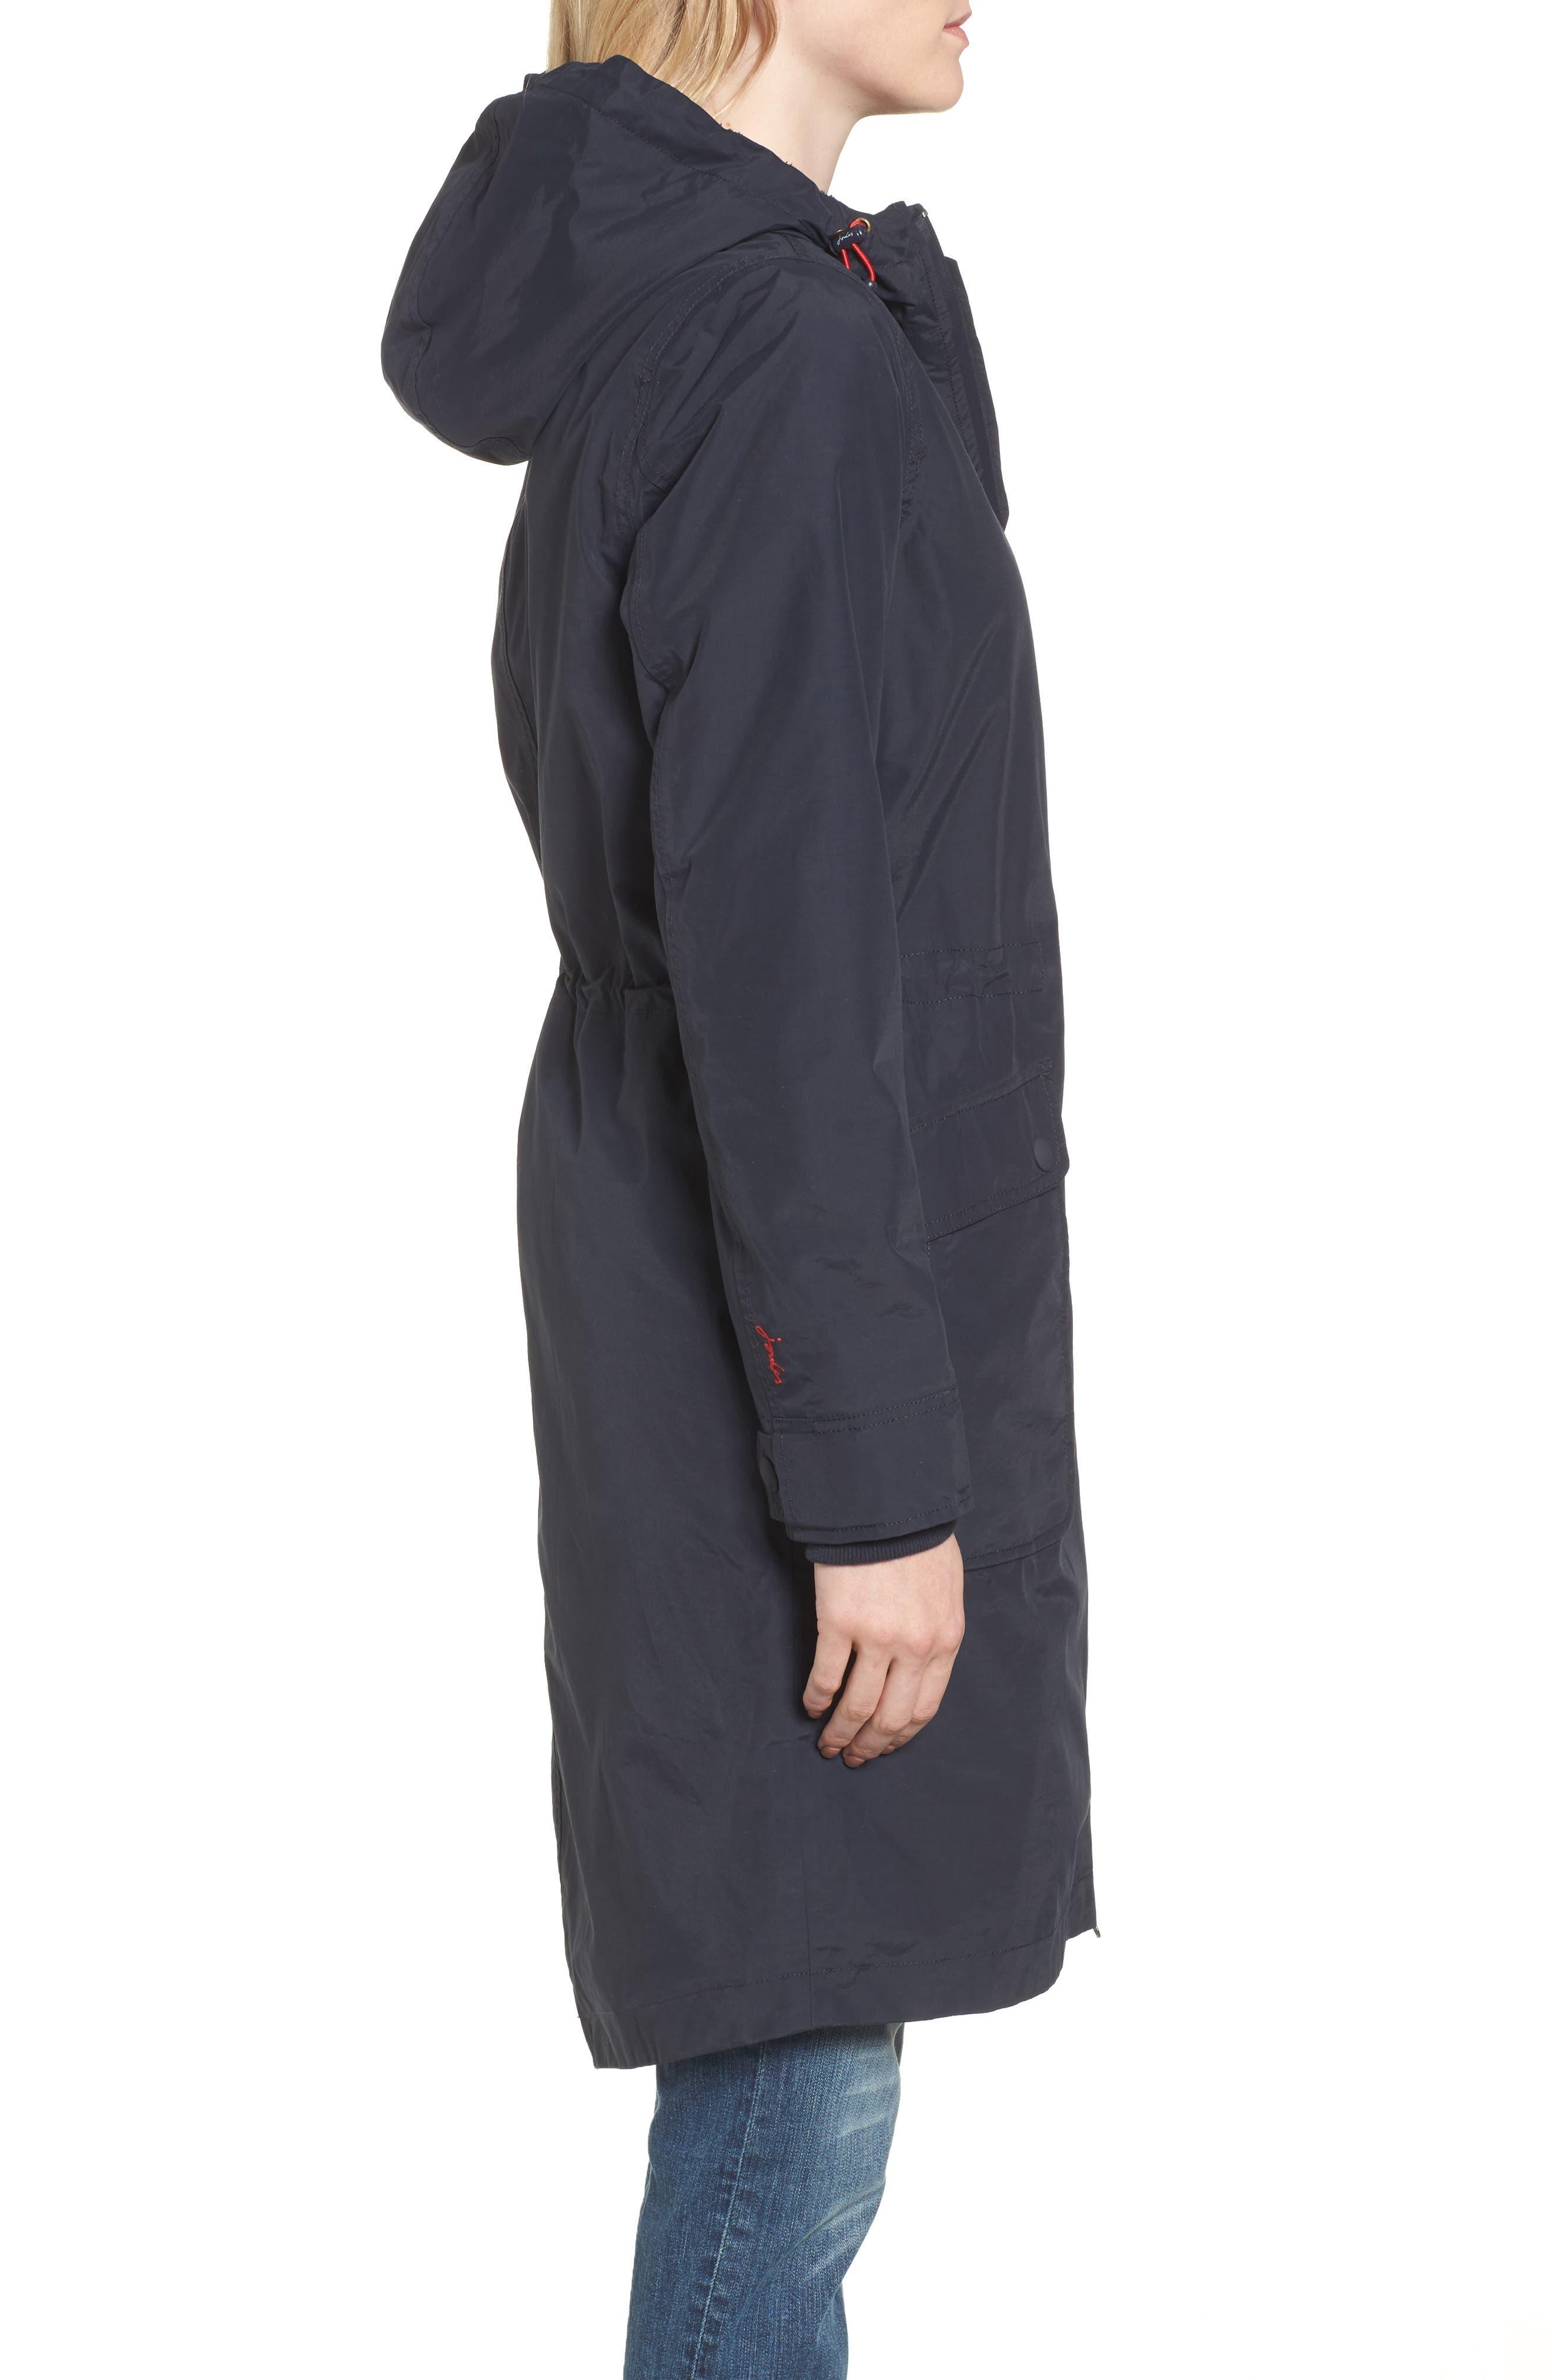 Hooded Fleece Lined Raincoat,                             Alternate thumbnail 3, color,                             Marine Navy